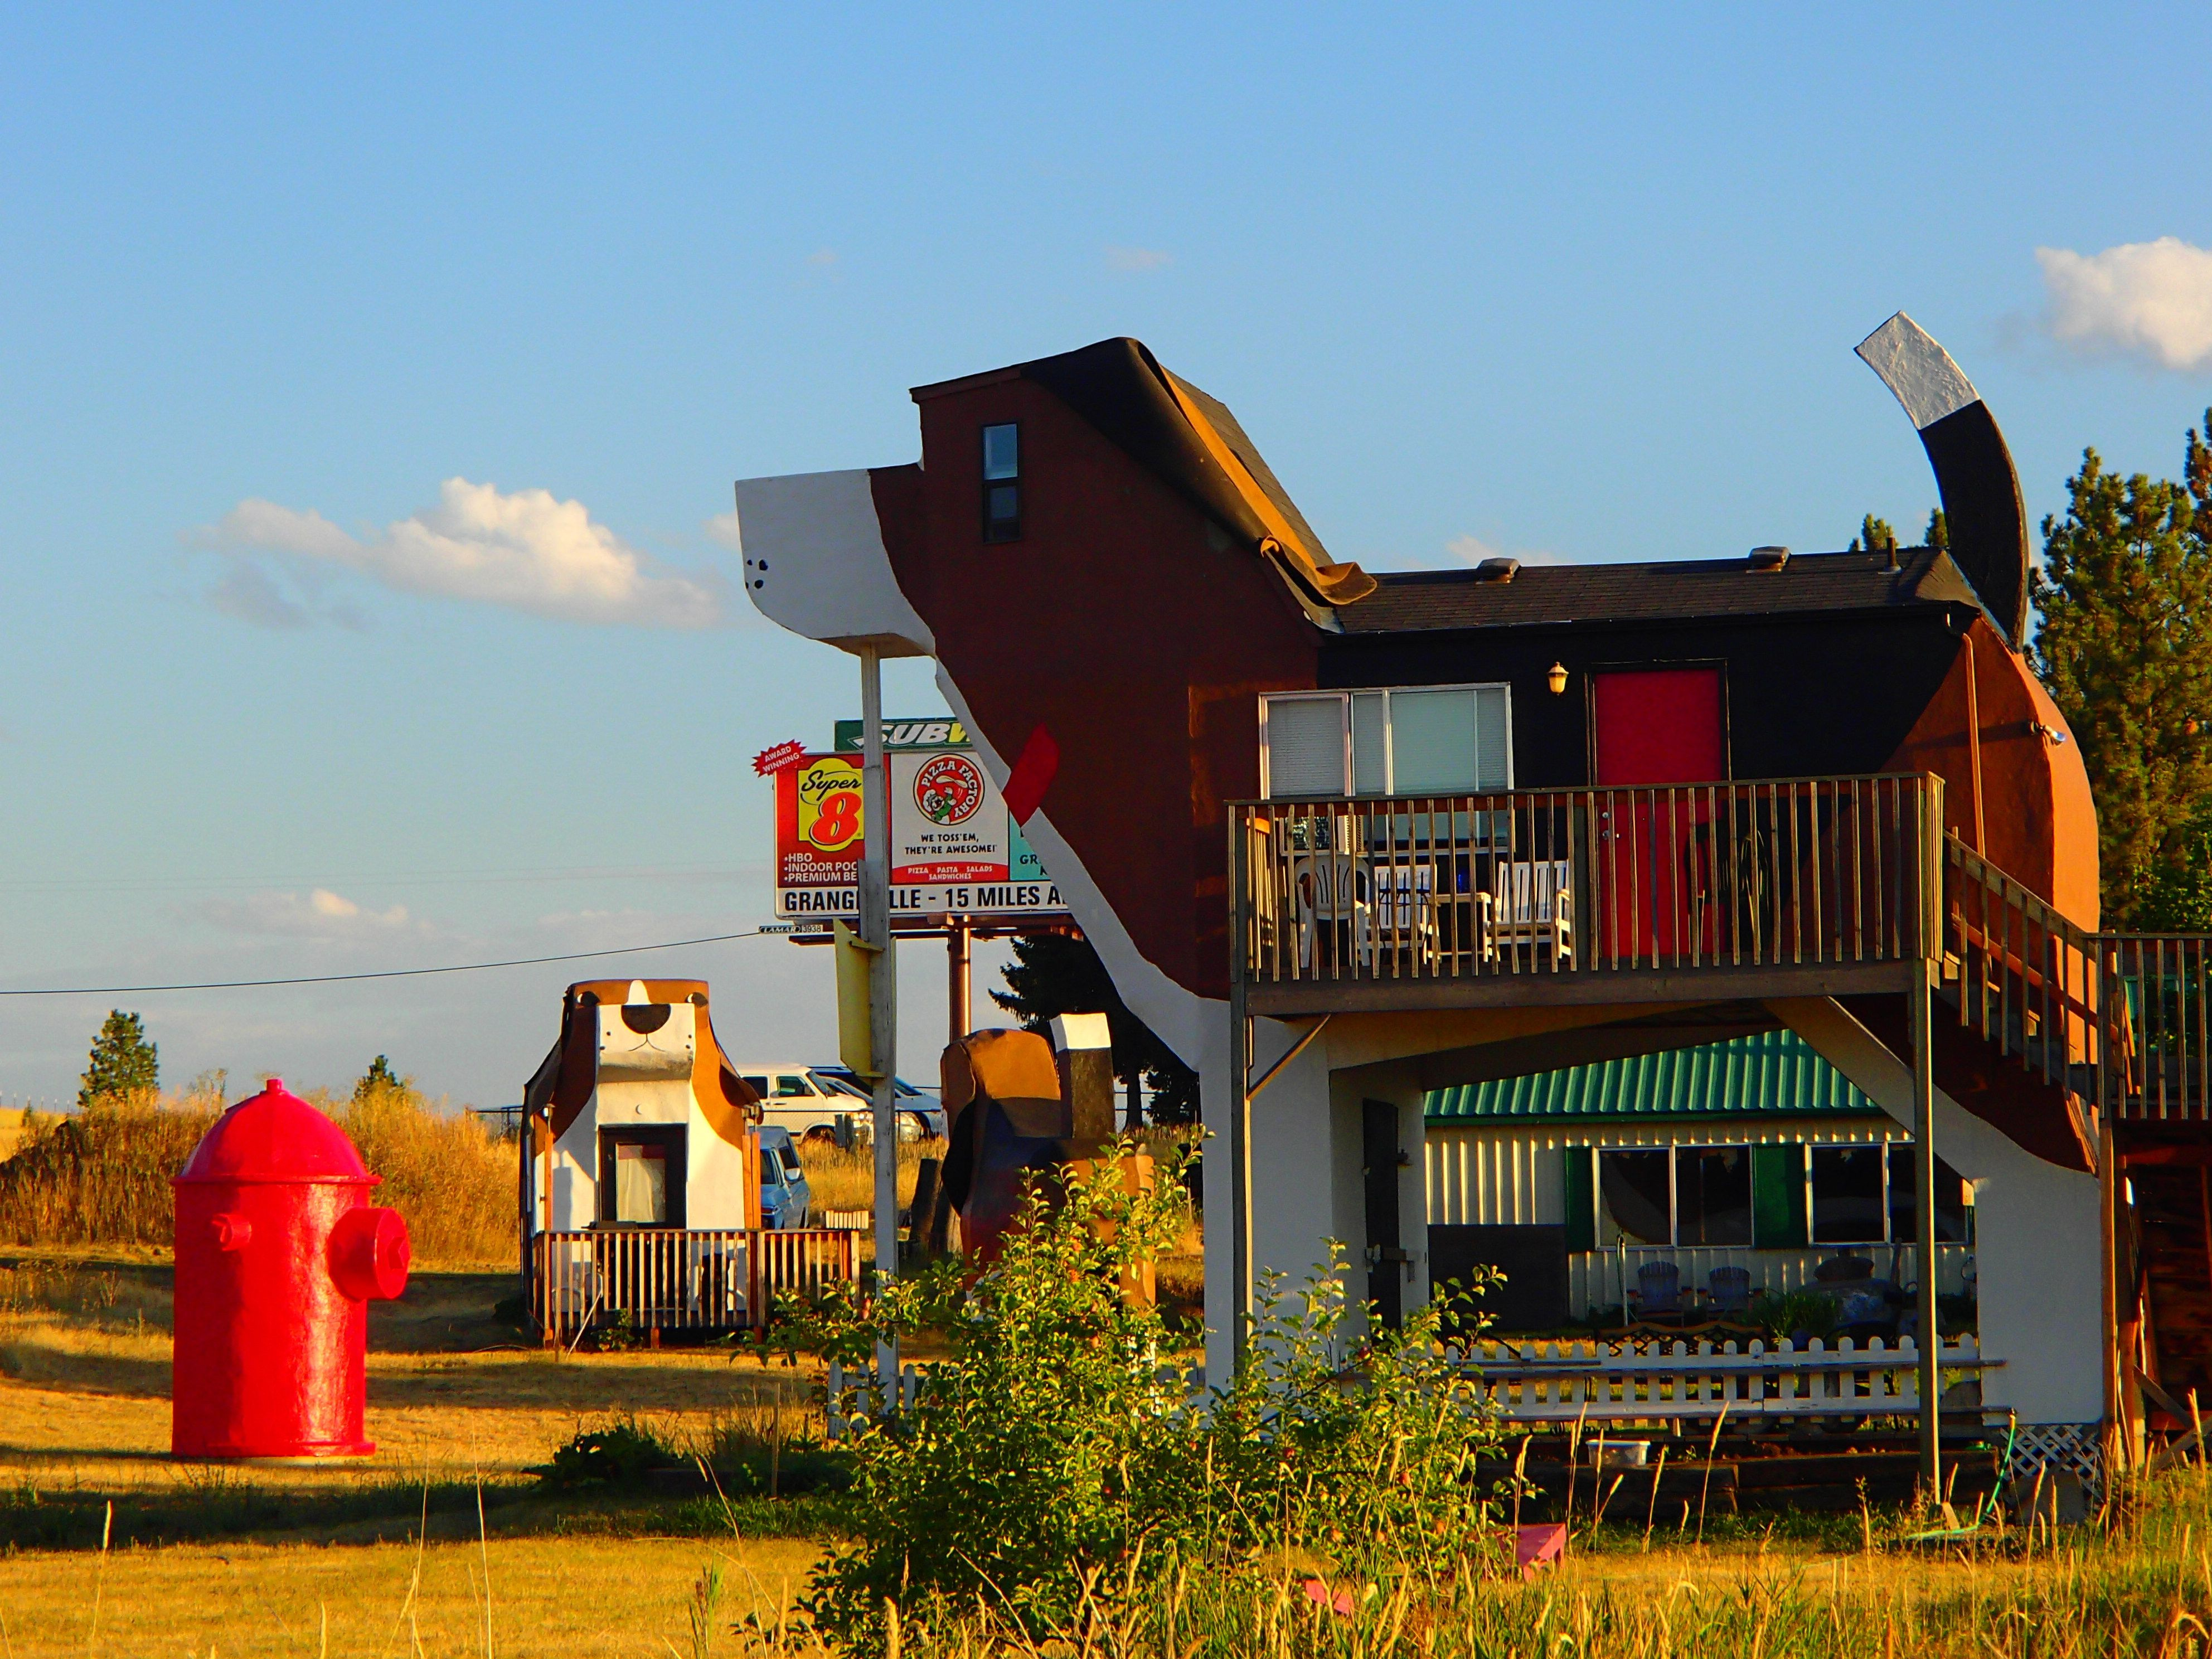 Perfect Our Date With The Big Dog: Dog Bark Park Inn [Cottonwood, Idaho] Ideas